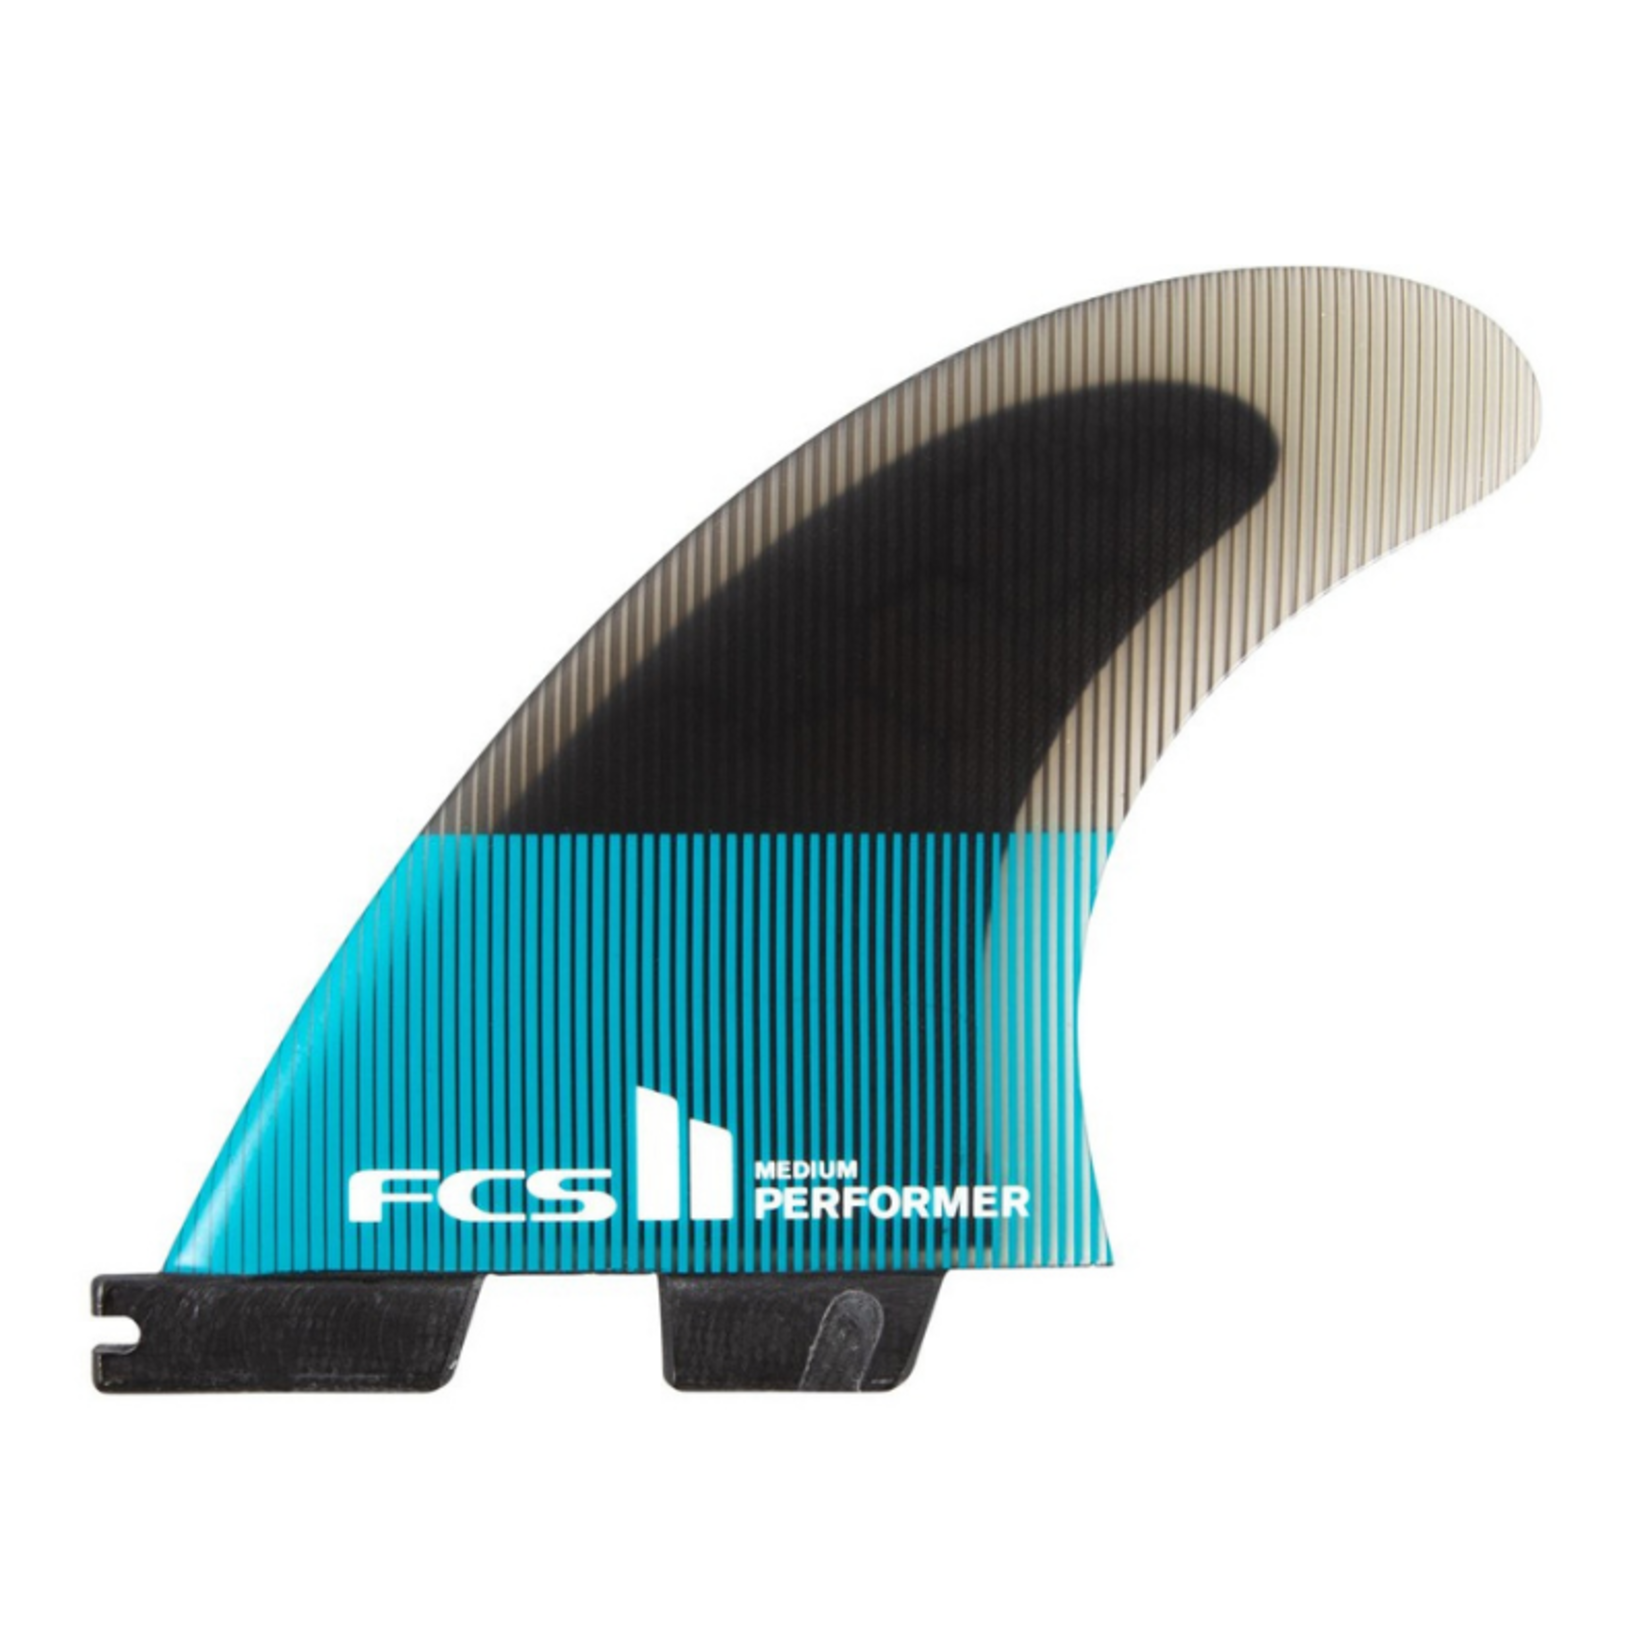 FCS II FCSII Performer PC Teal/Black Tri Fins